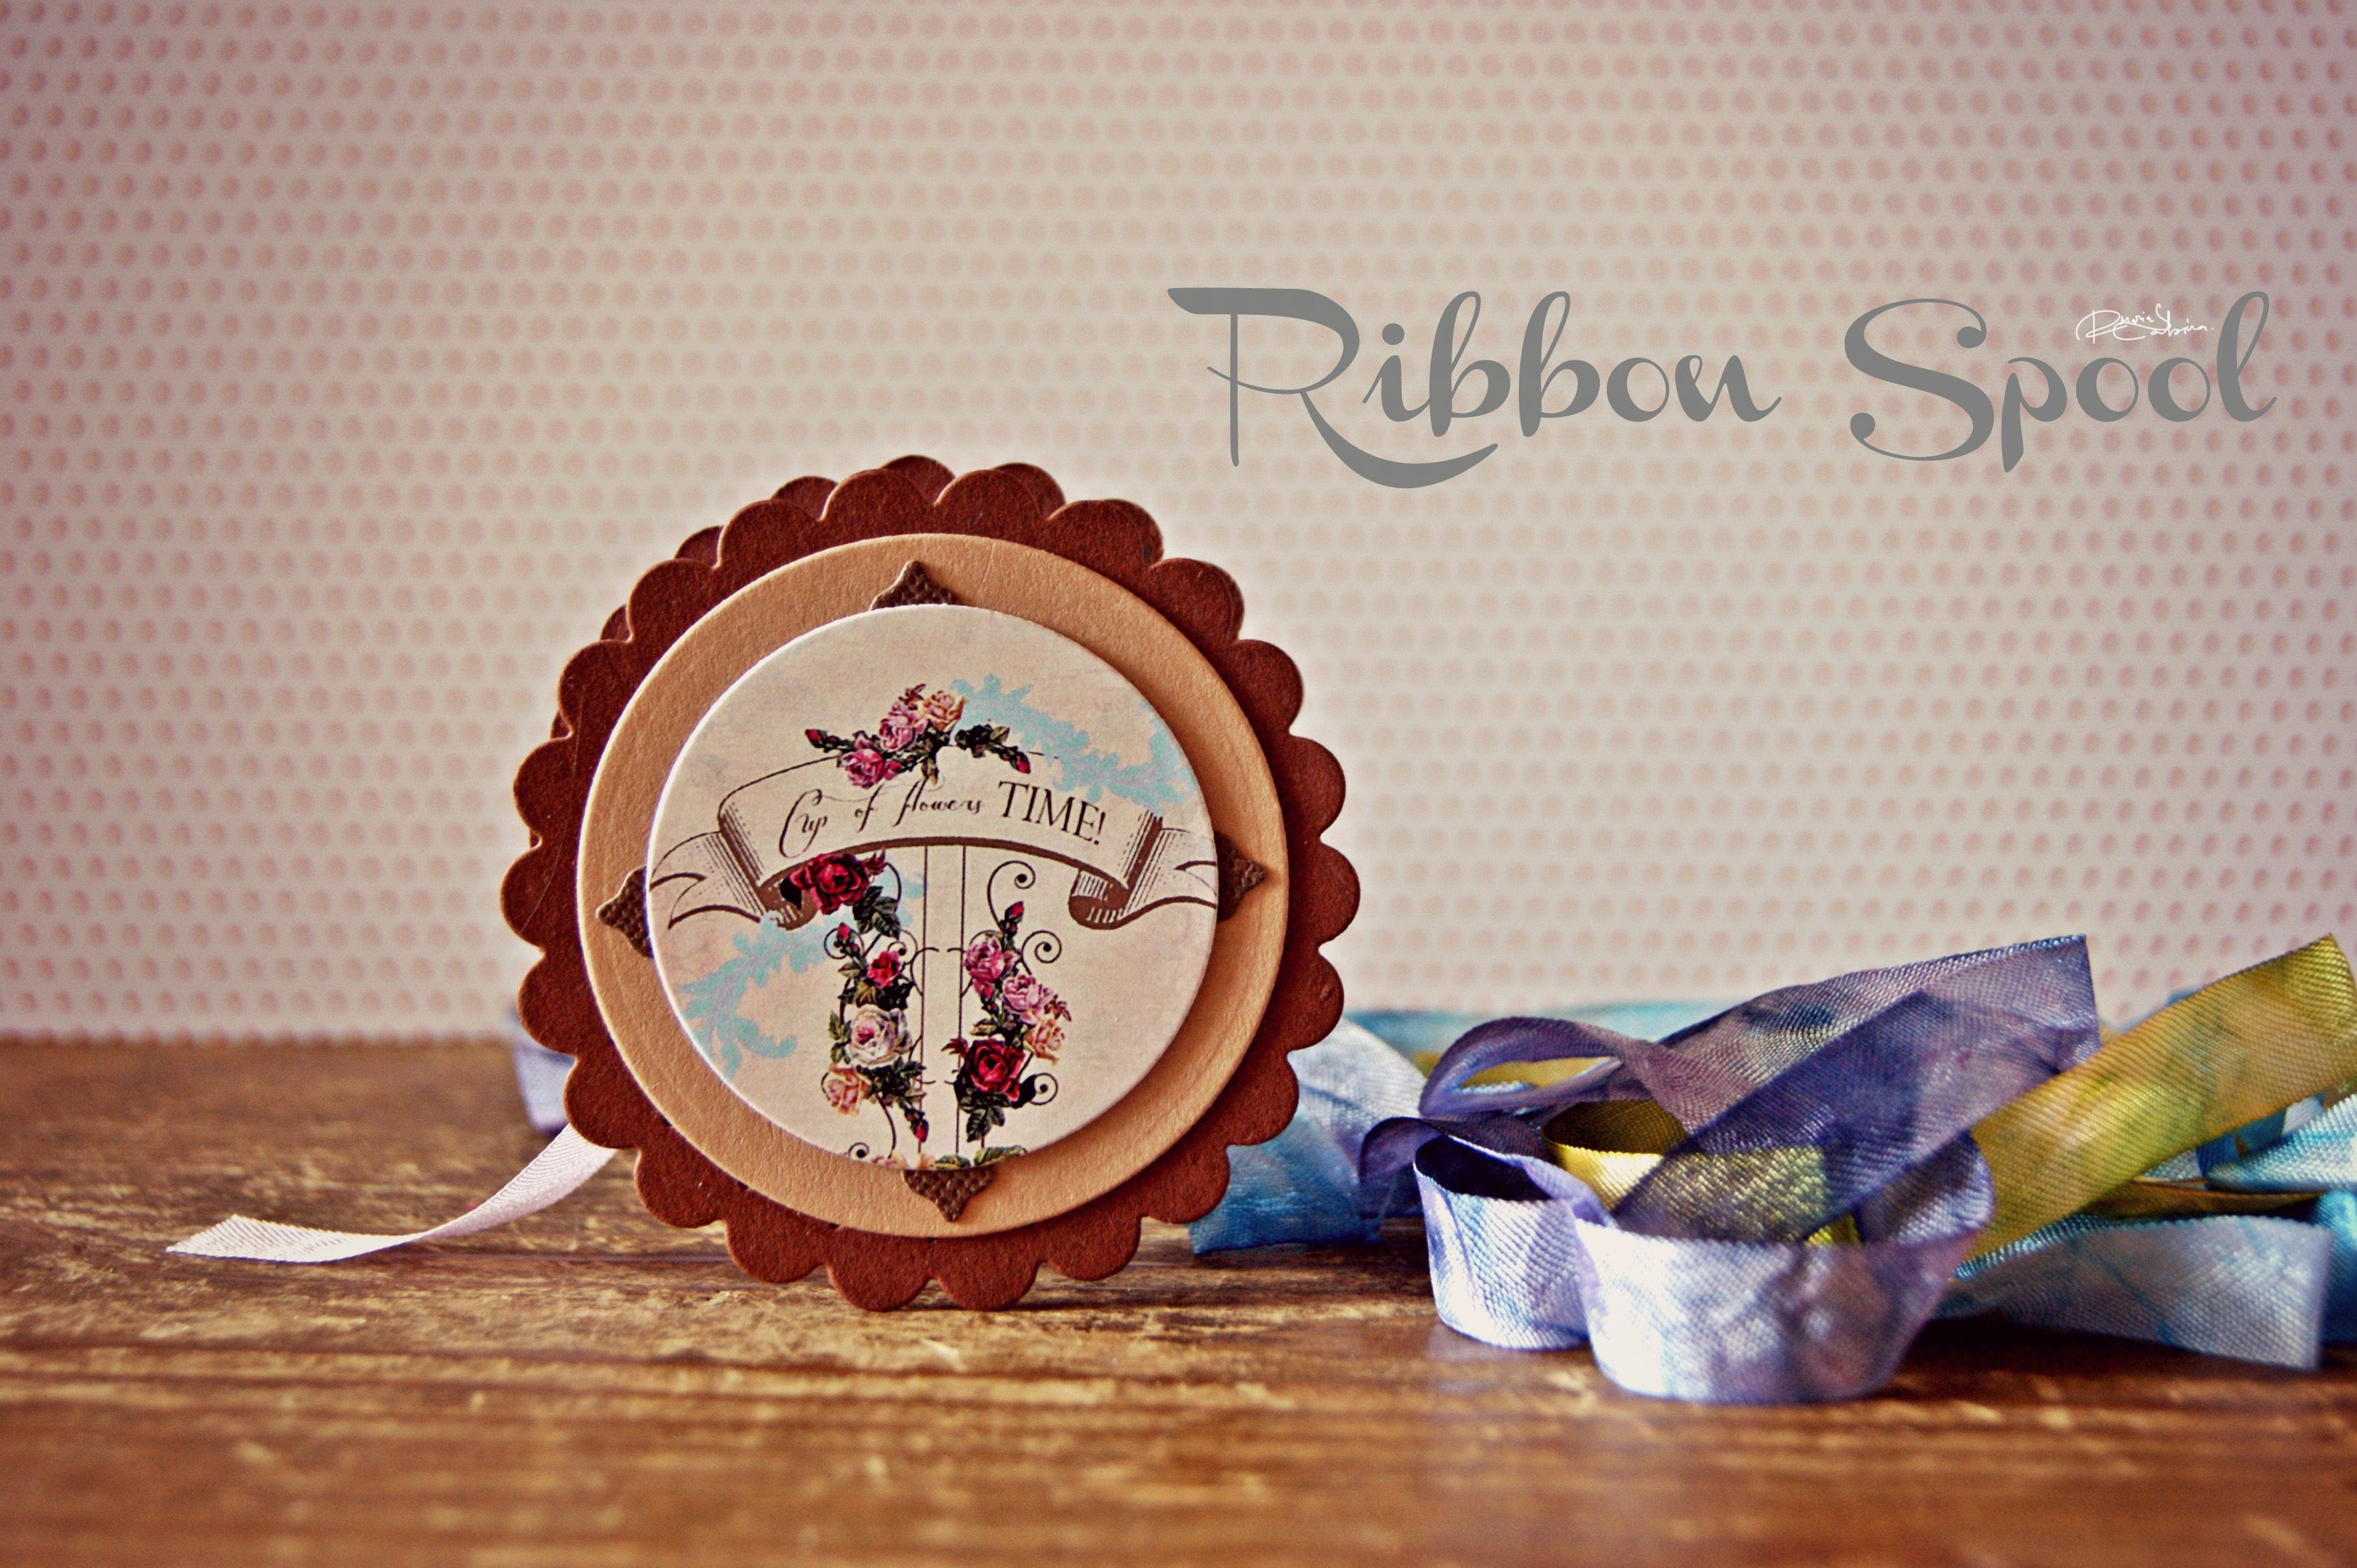 http://lollyrot-scrapbooking.blogspot.ro/2013/01/ribbon-spool-recycle.html